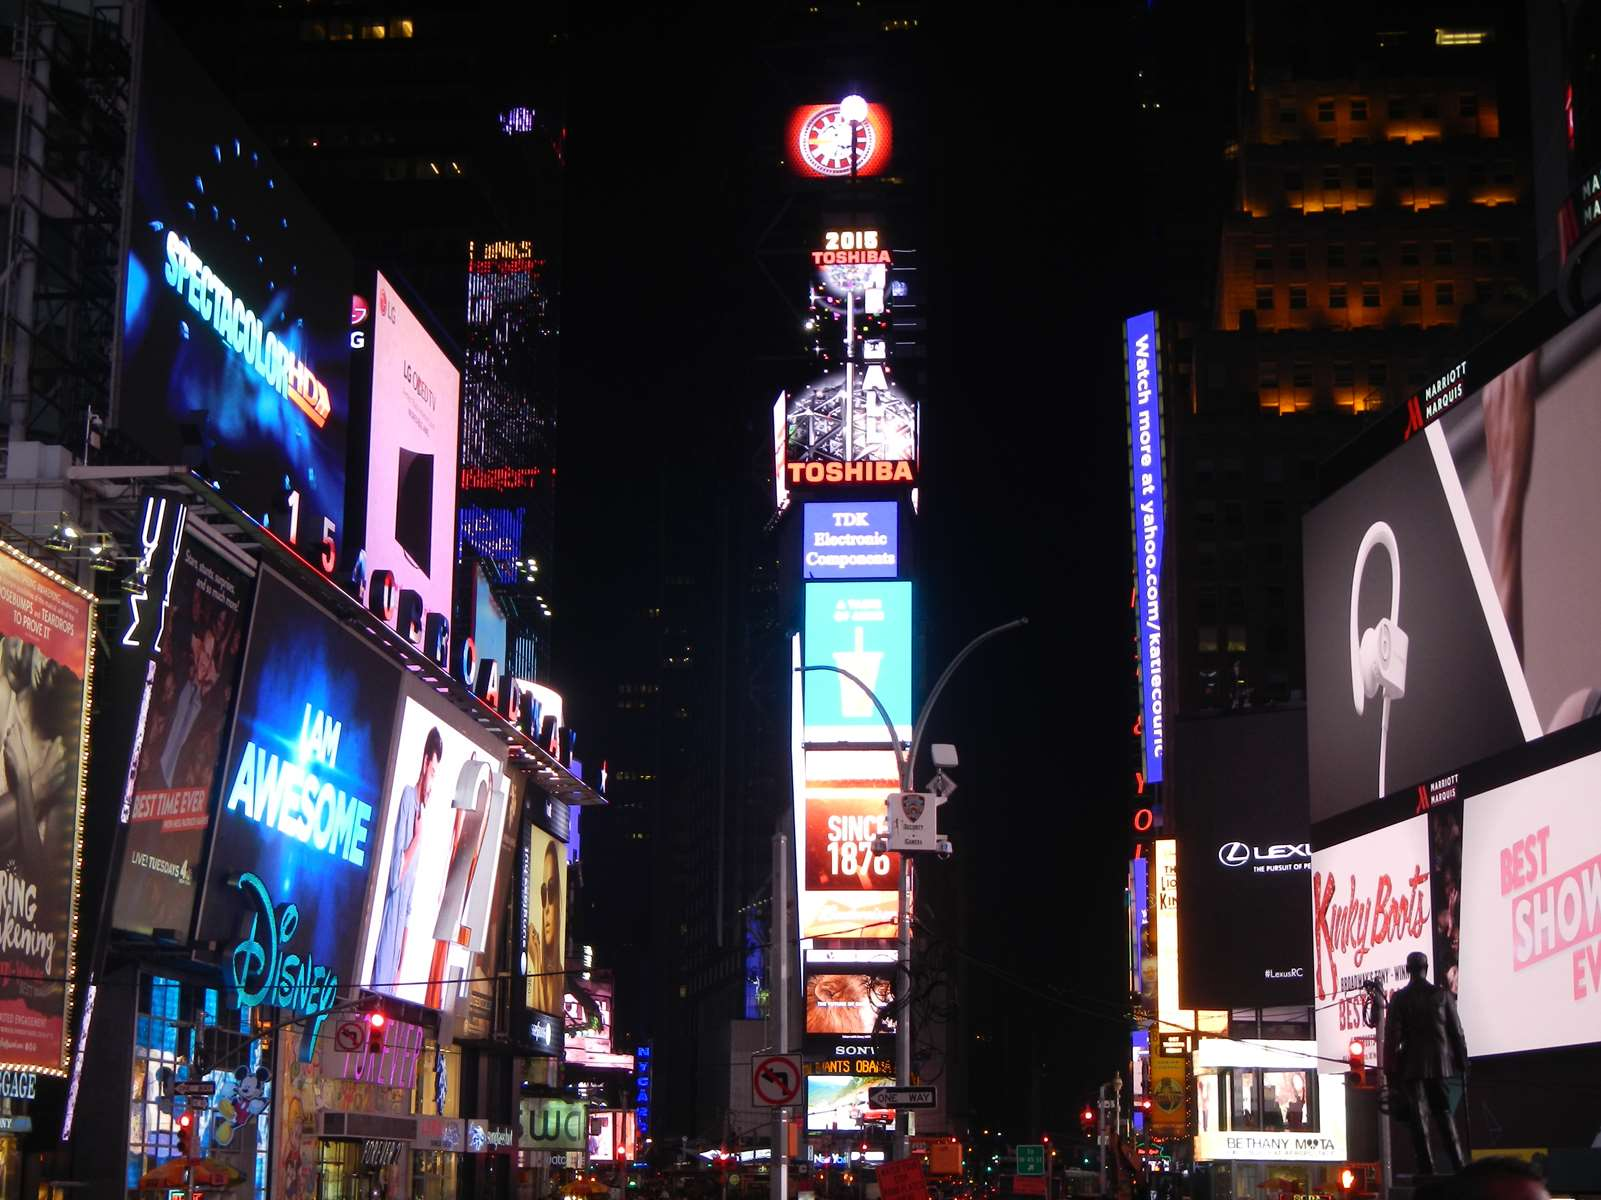 New York Arrivée à Times Square ! Clainronyva